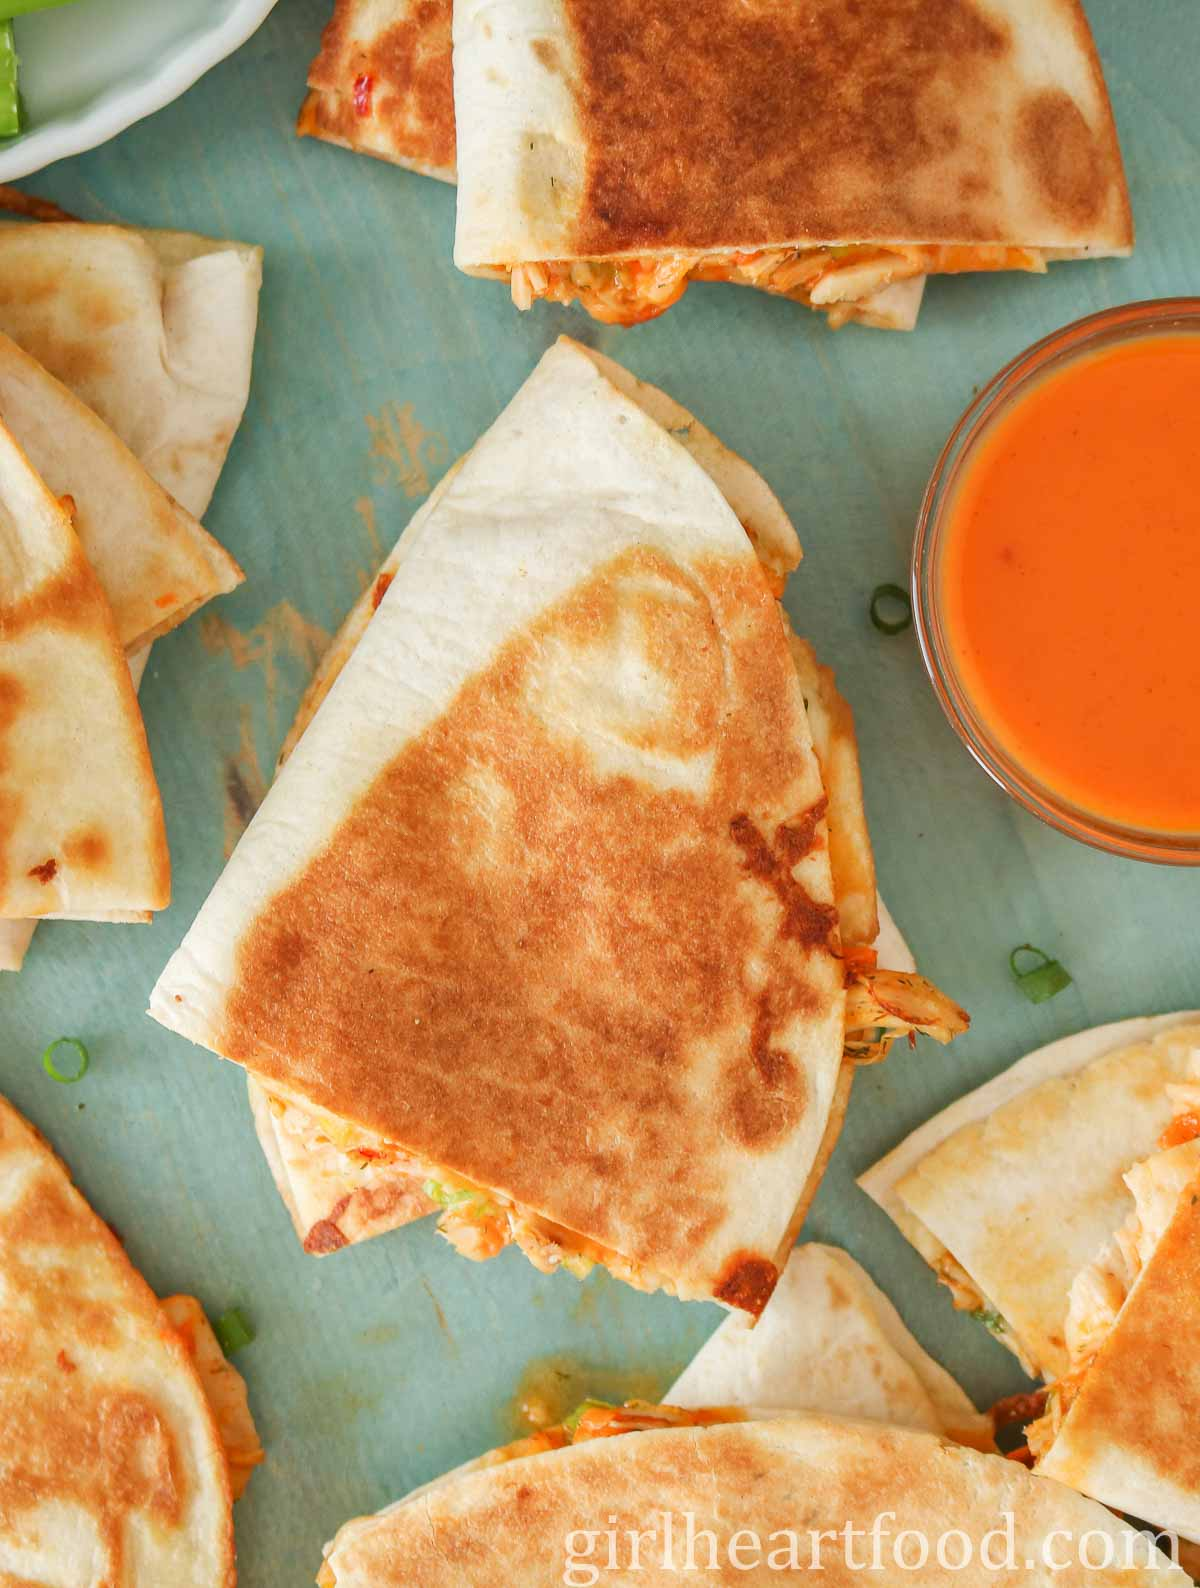 Crispy quesadillas on a blue board next to a small dish of buffalo hot sauce.